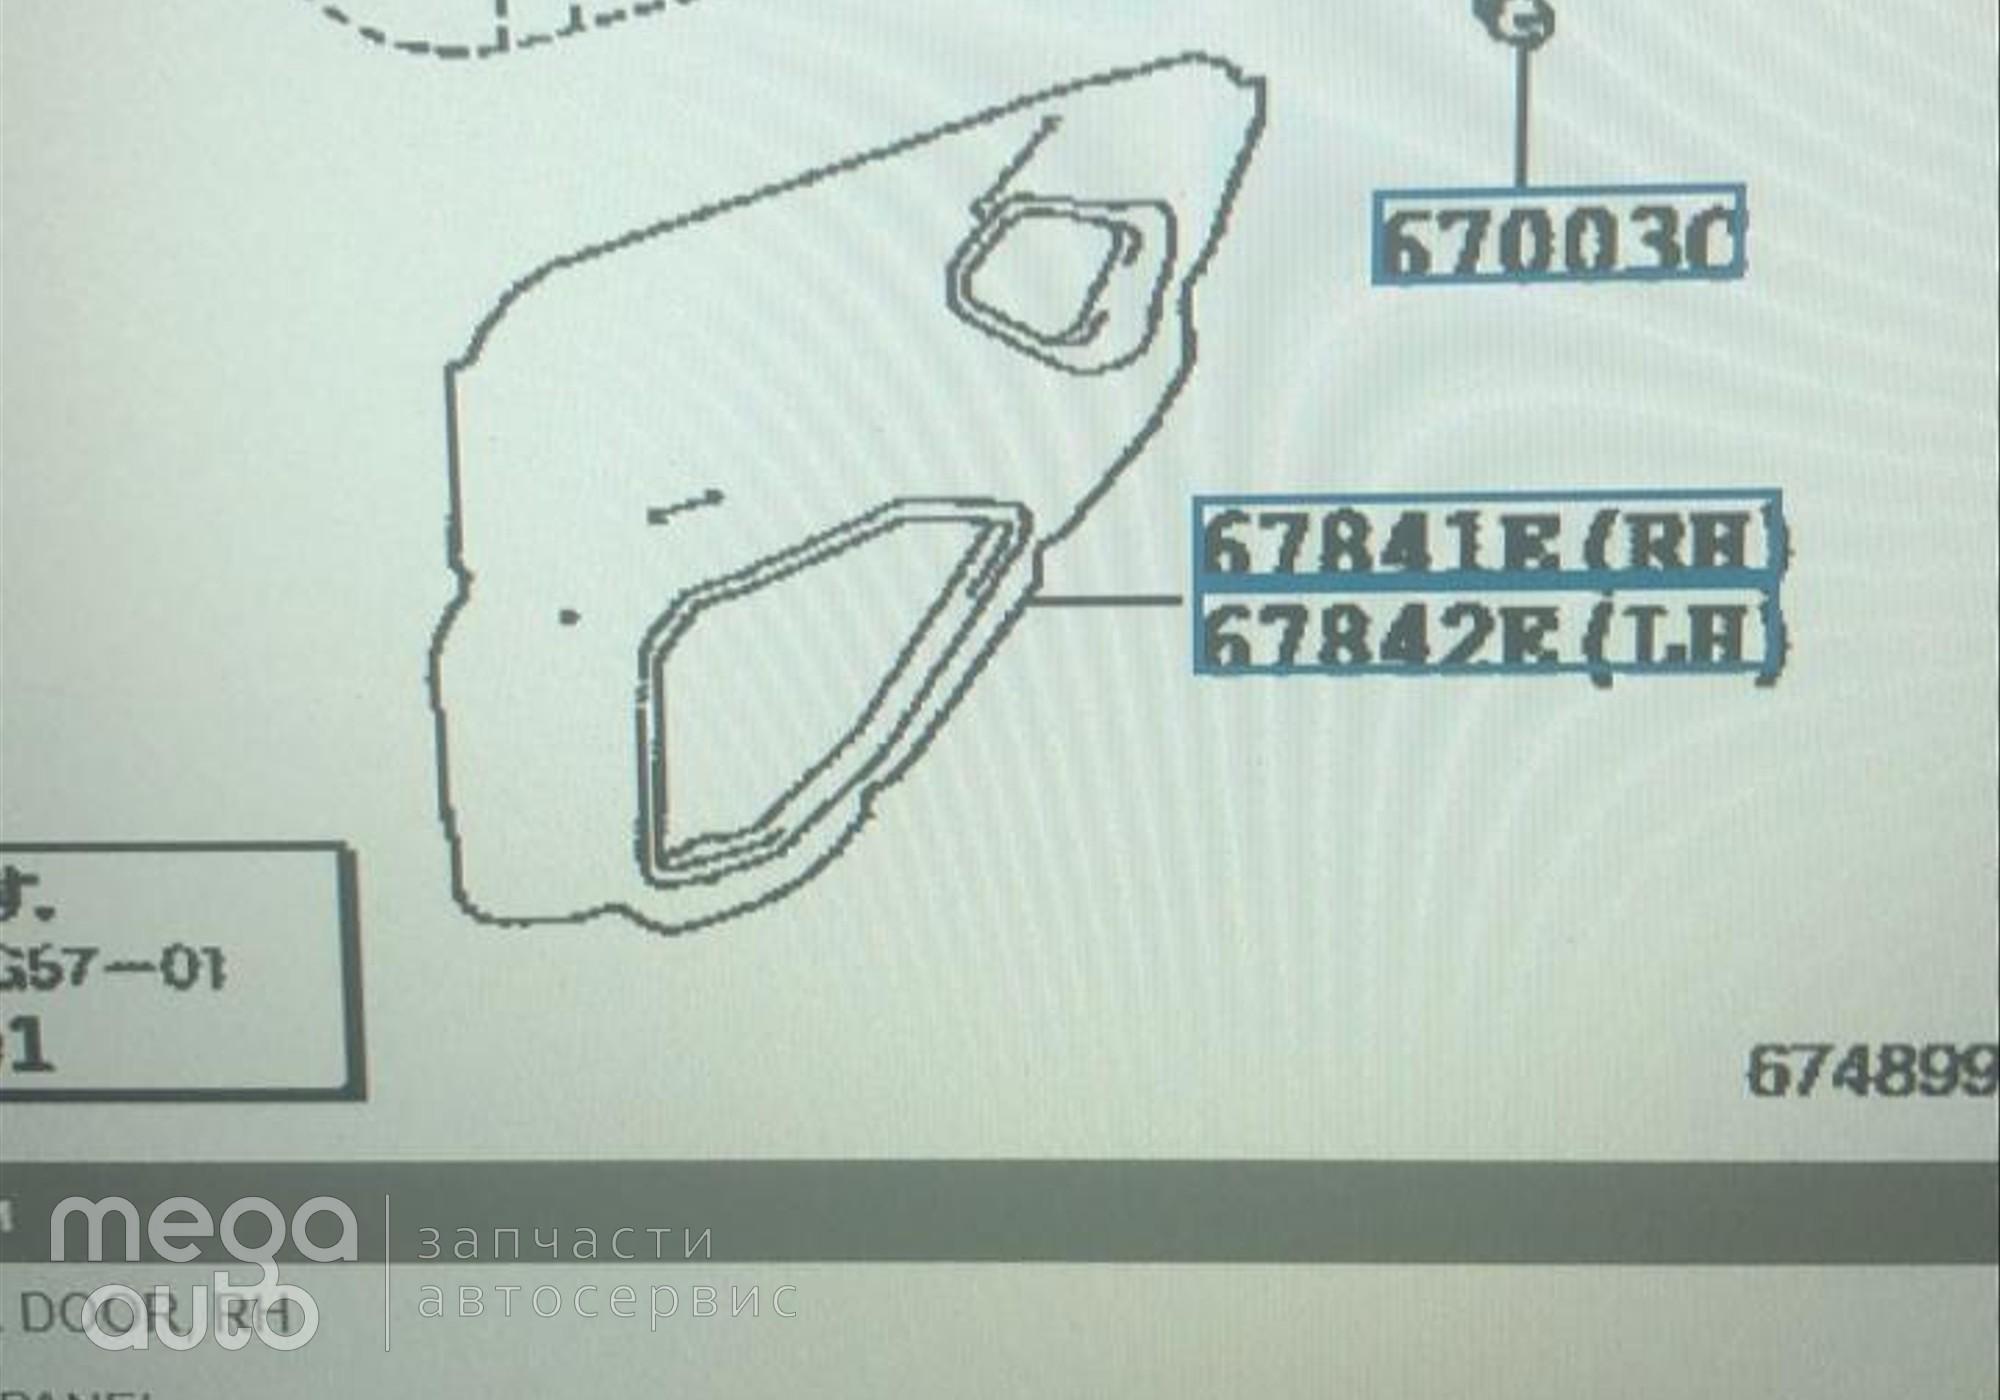 6784112360 Заглушка ручки двери правая для Toyota Corolla E140/E150 (с 2007 по 2013)